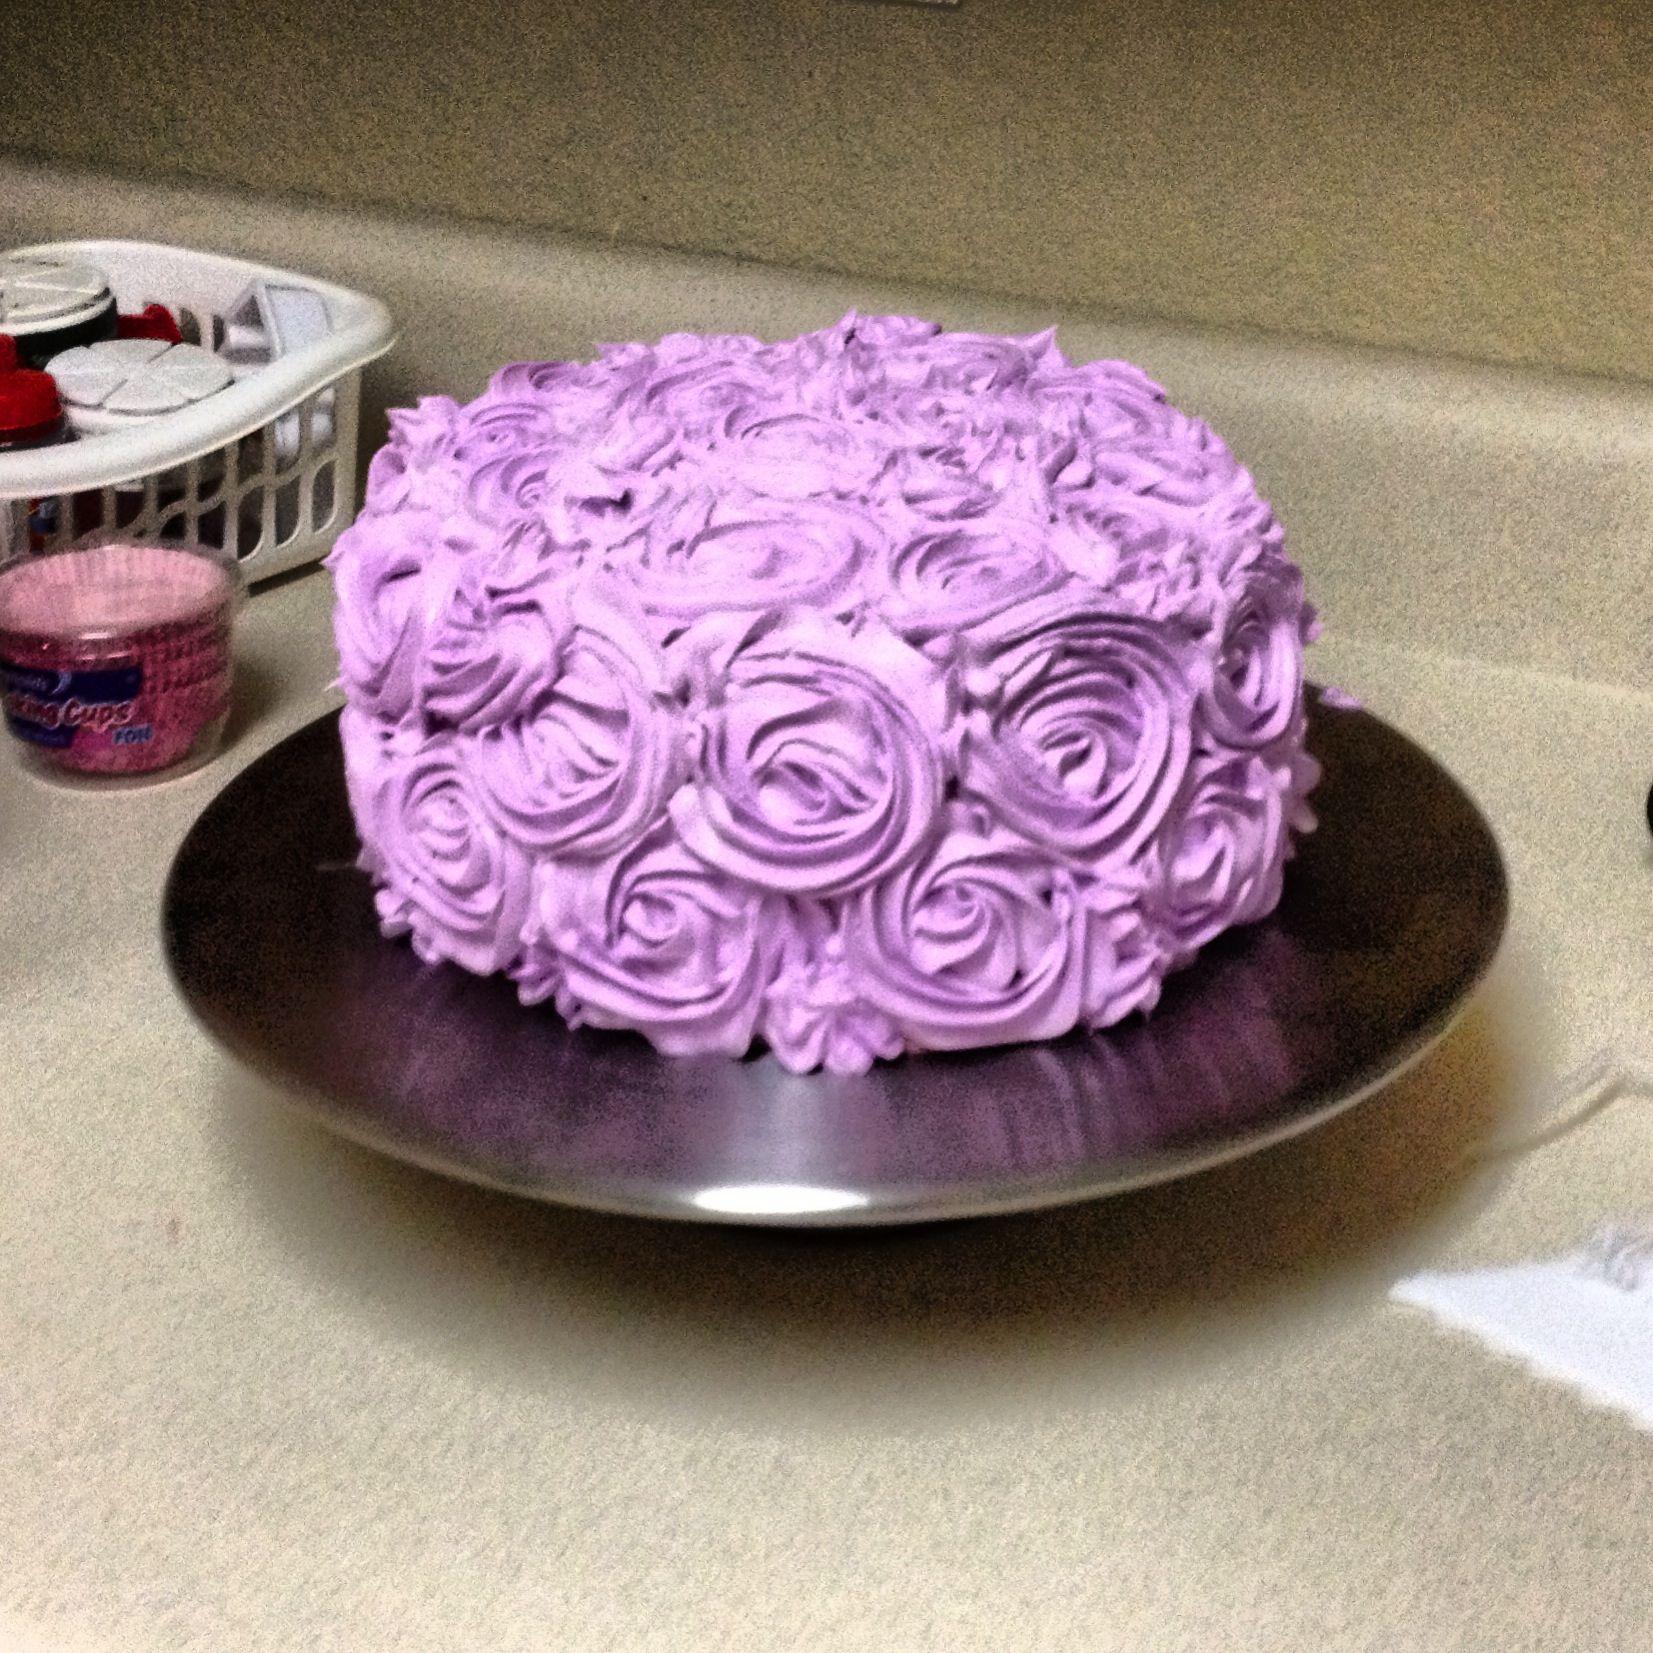 Pin Stunning Aishwarya Rai   Unseen Wallpaper Cake on ...